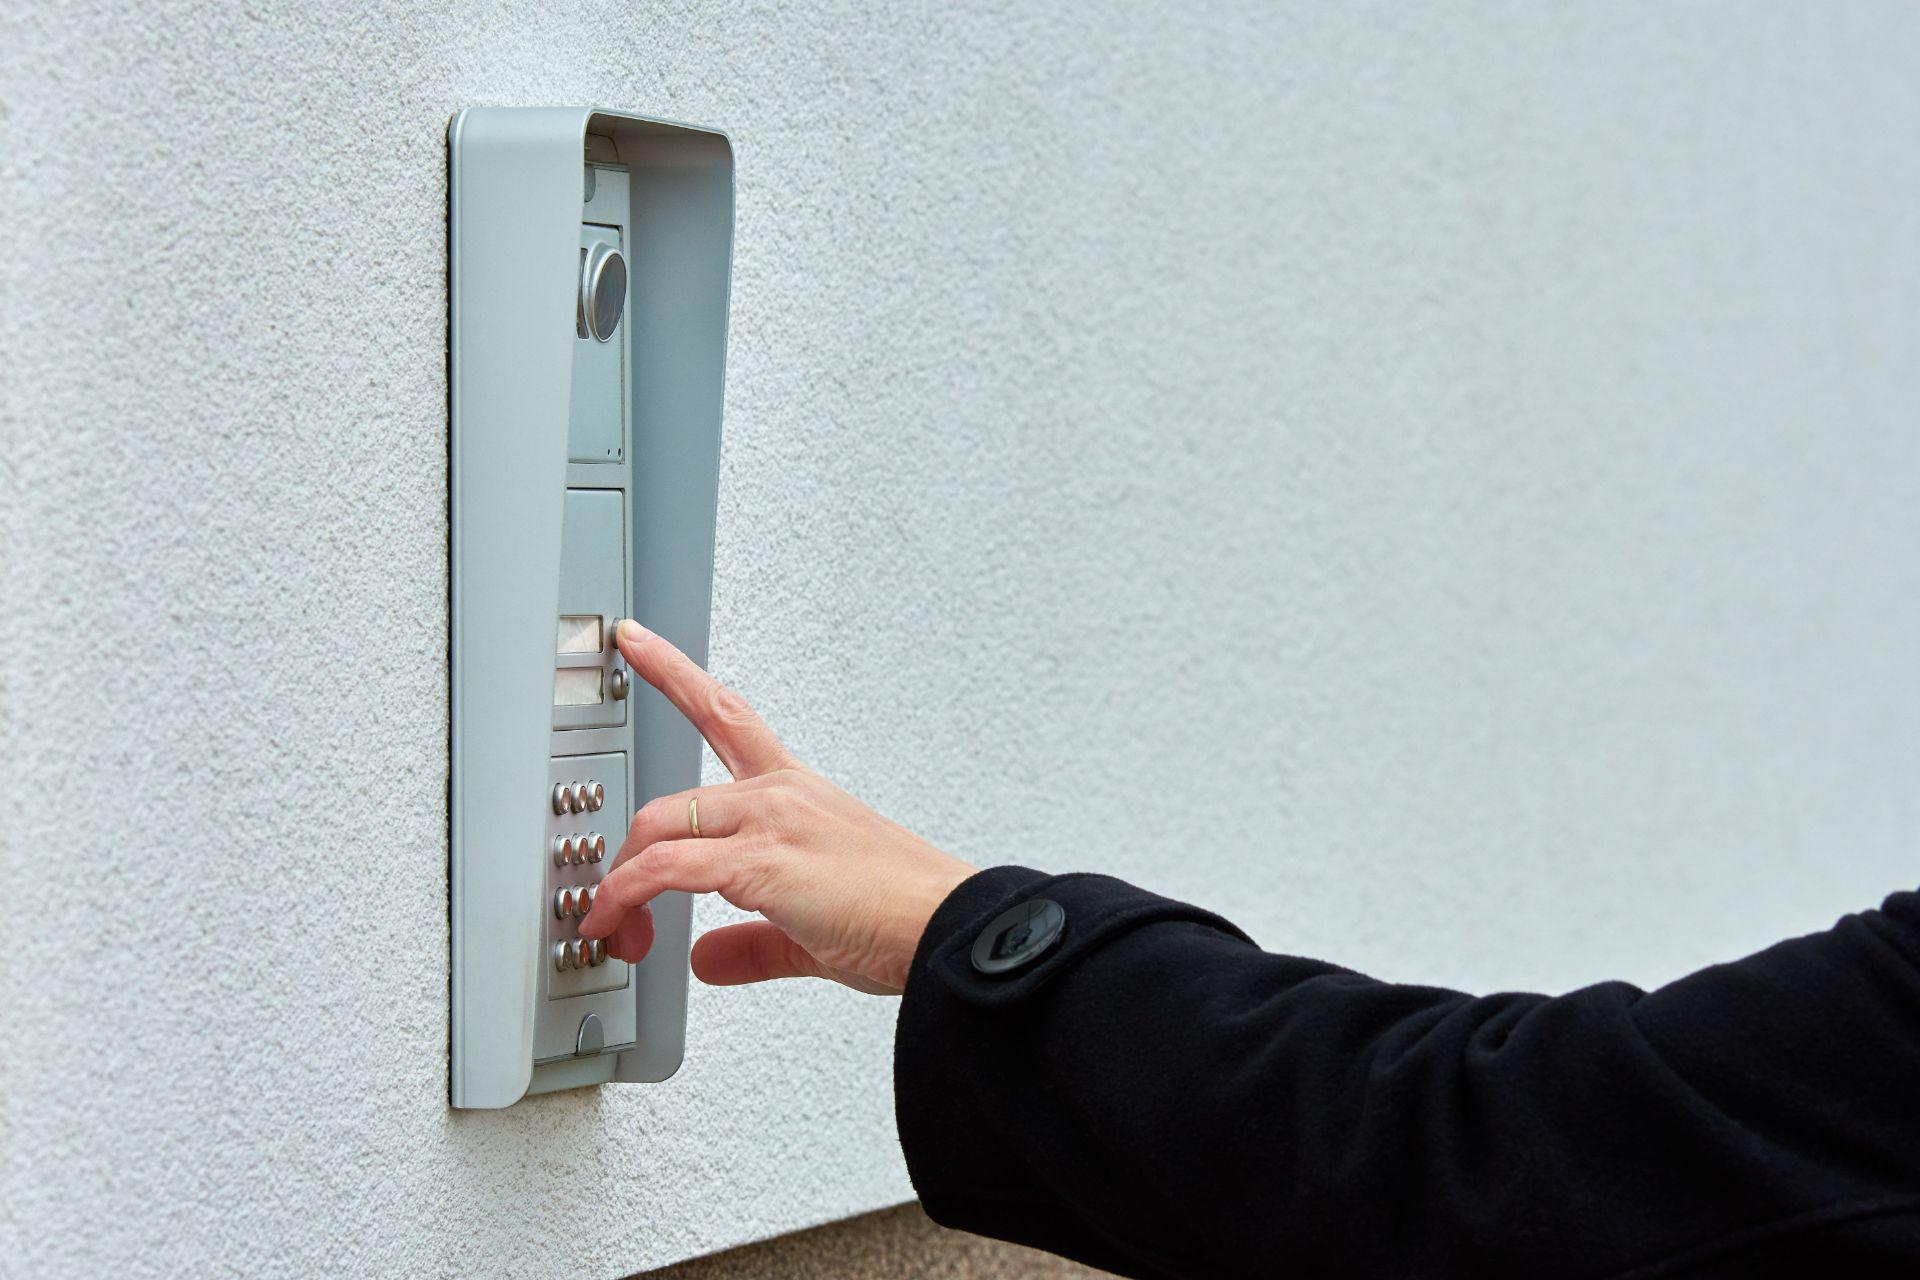 employee using intercom system